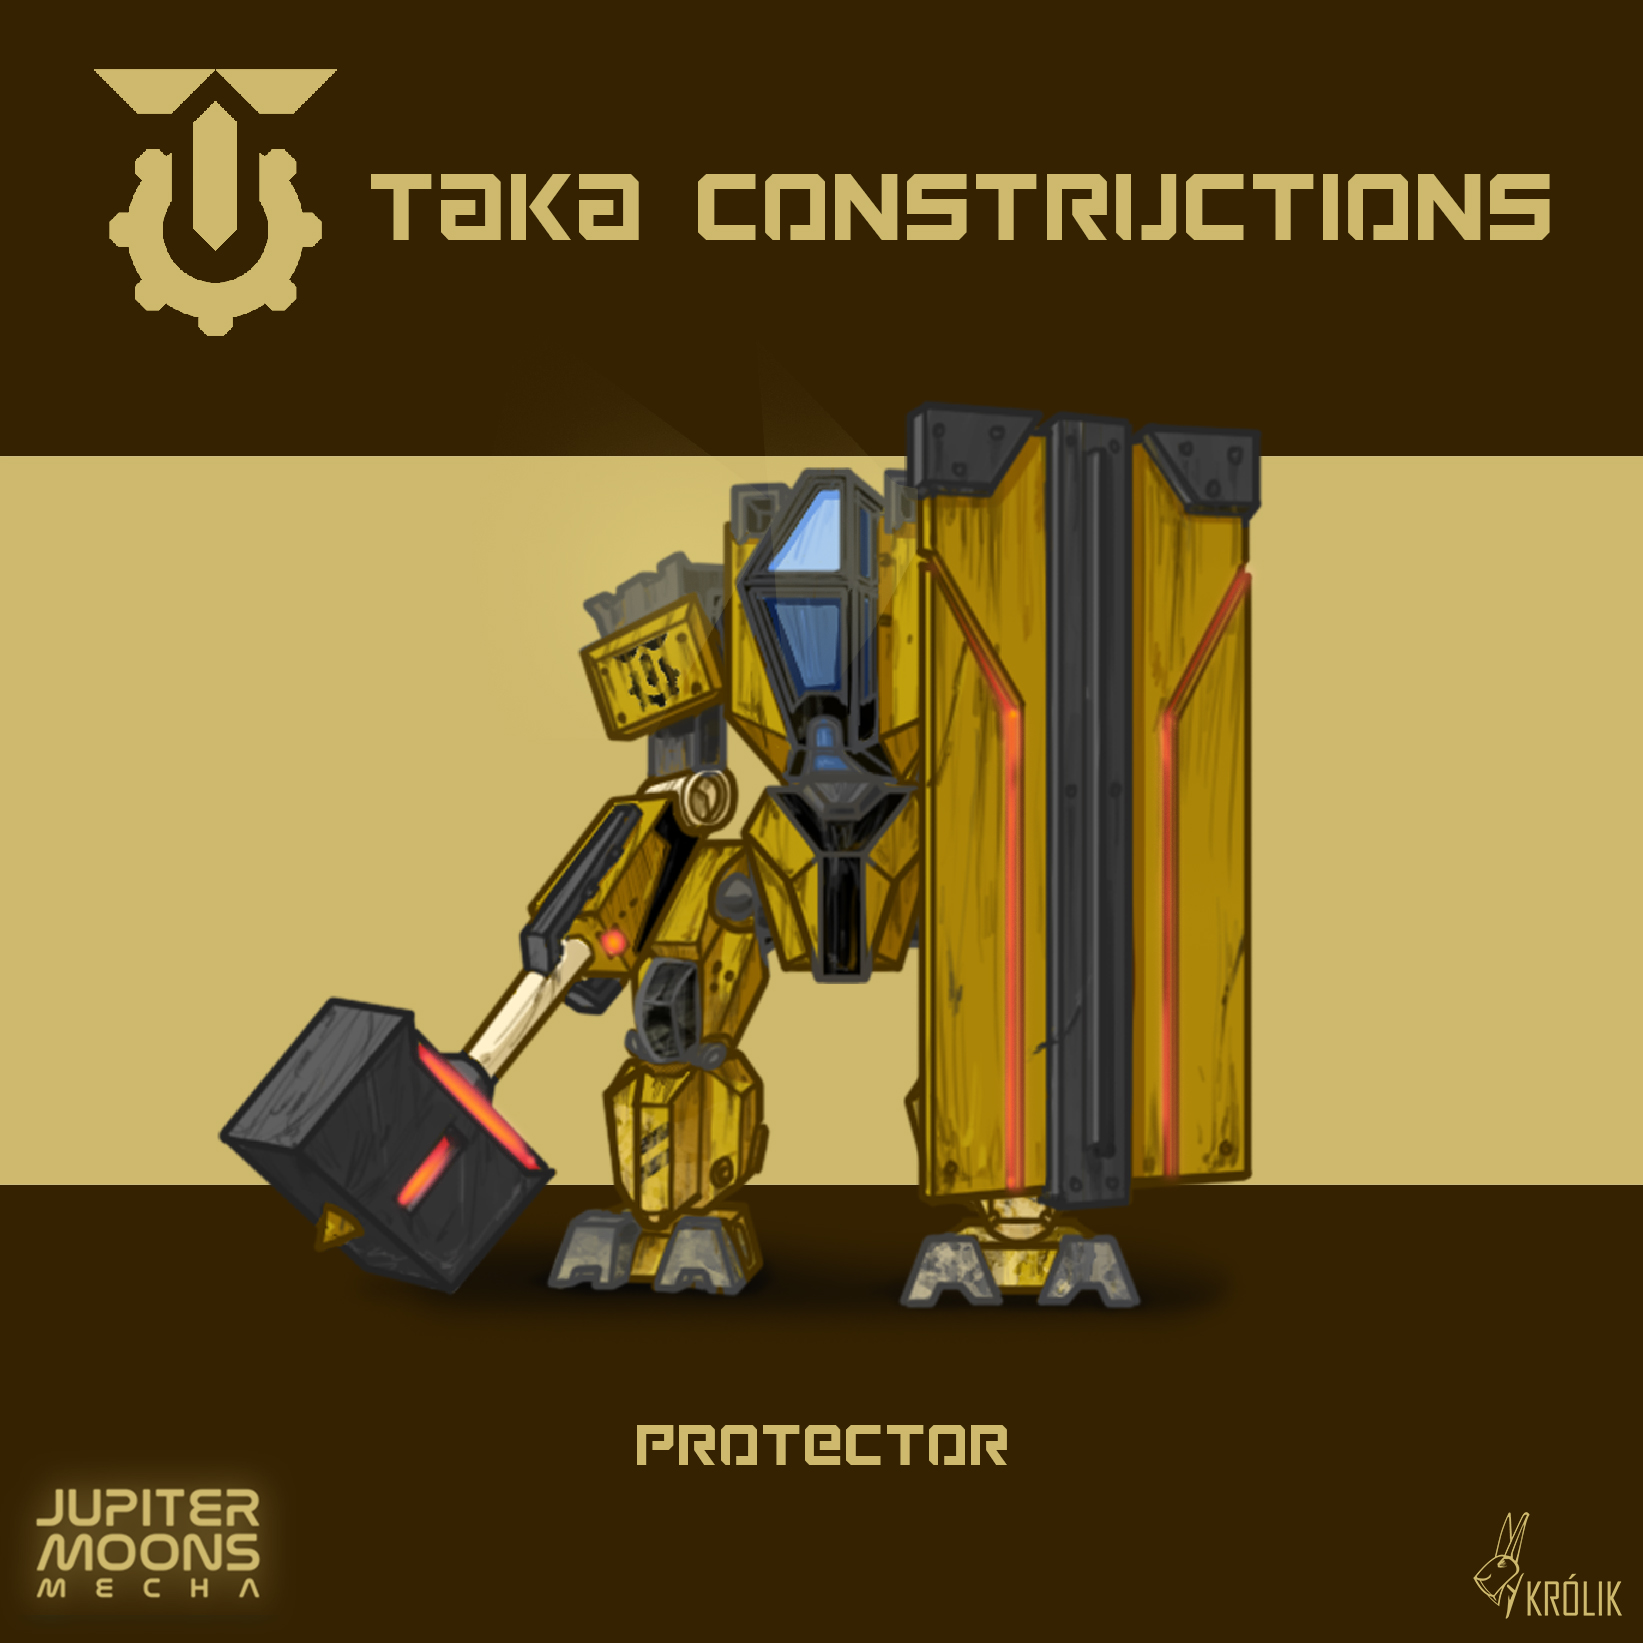 taka construtions protector